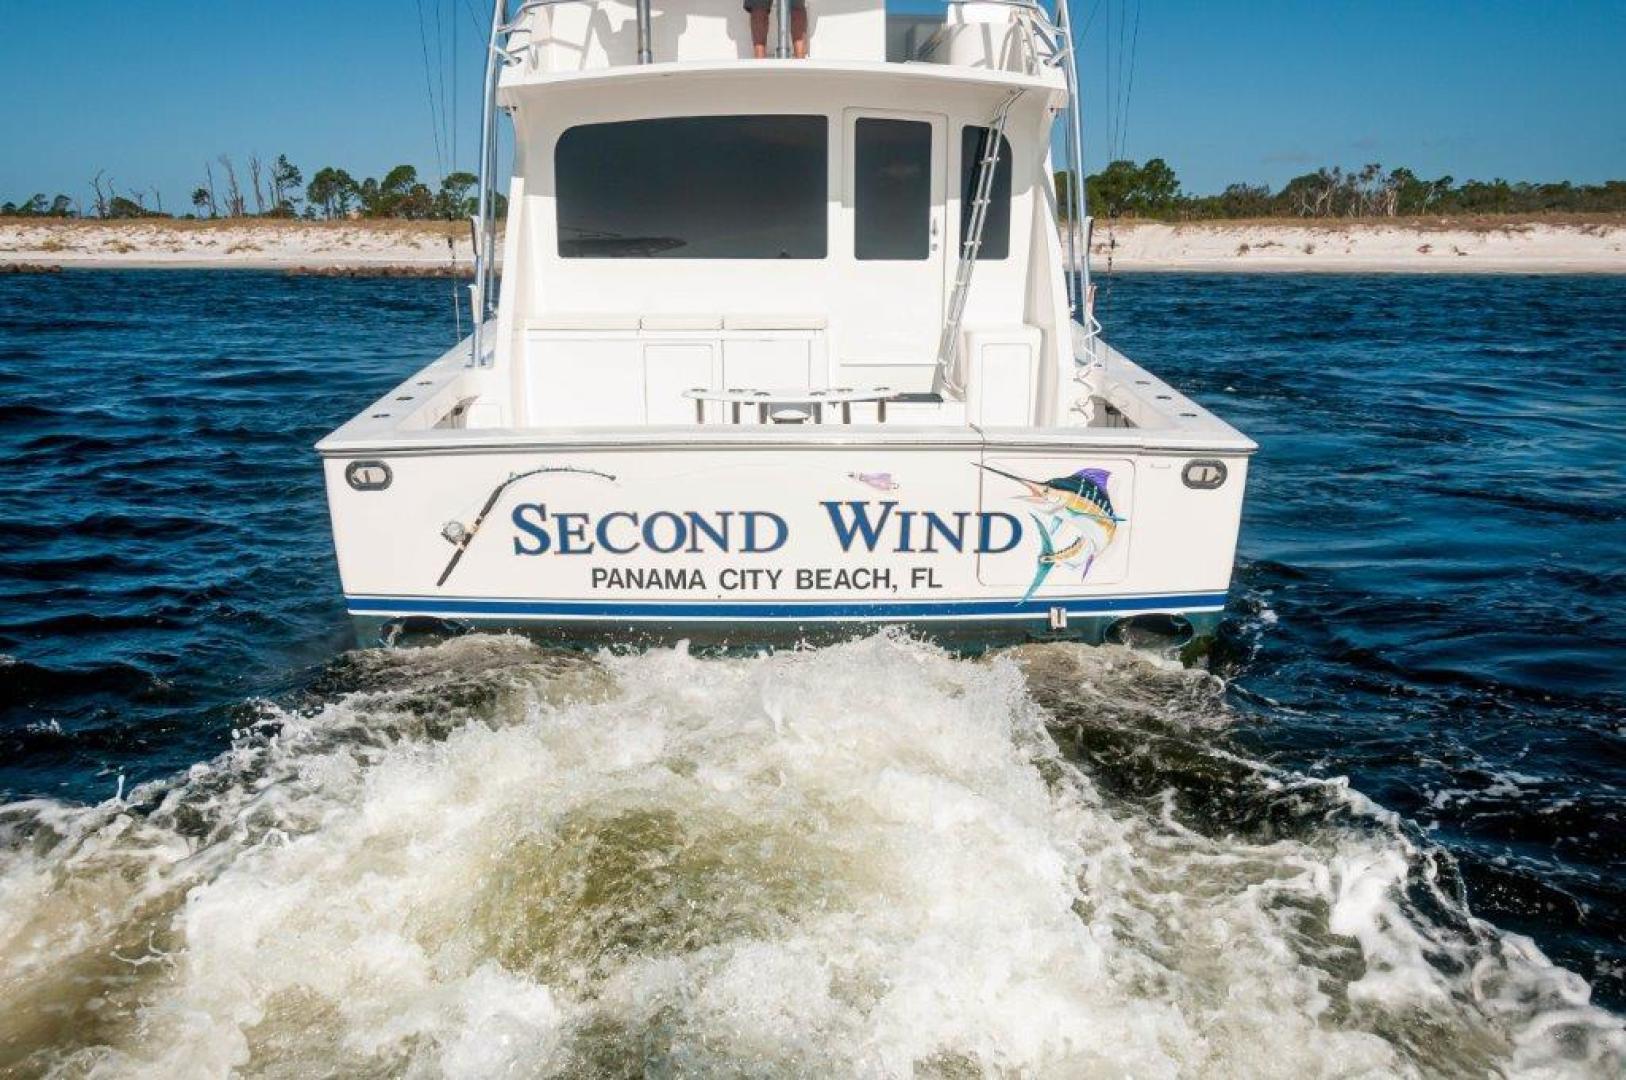 Viking-61 Convertible 2004-Second Wind Panama City Beach-Florida-United States-2004 61 Viking Convertible Second Wind Transom (4)-1545124 | Thumbnail